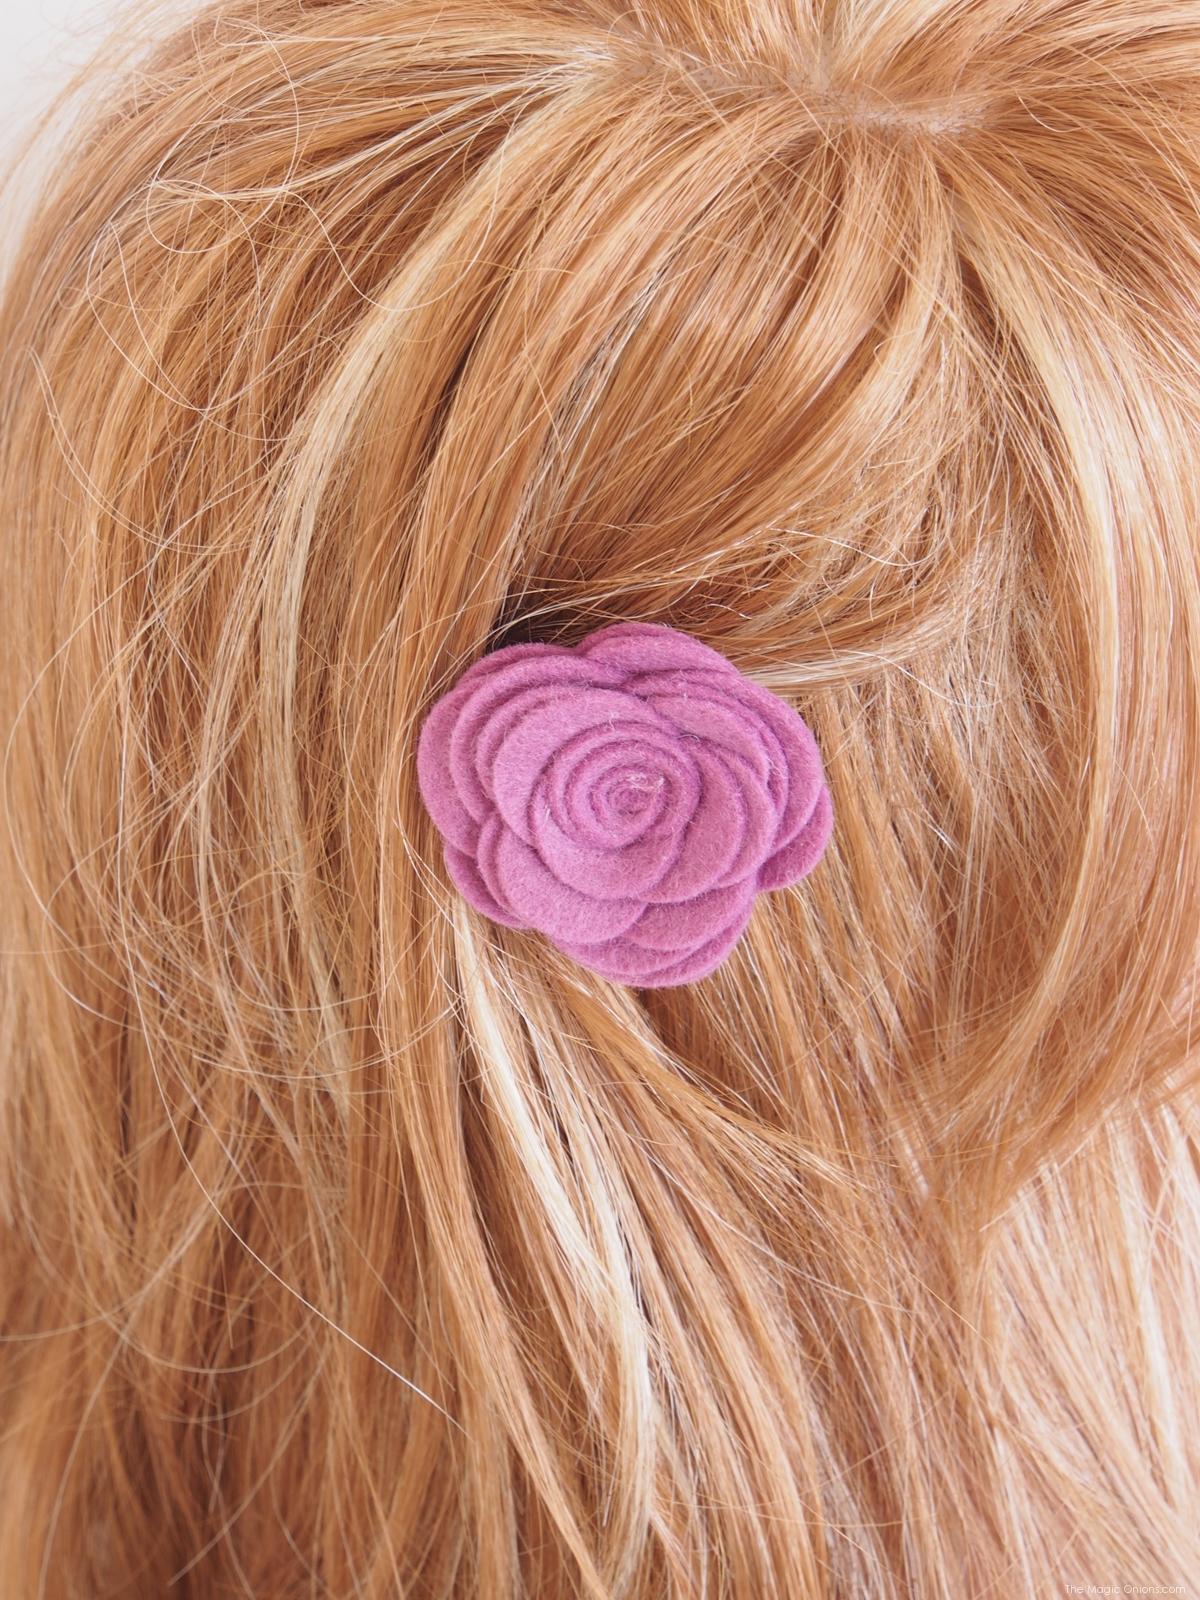 Make DIY Felt Flower Hair Barettes for Spring with The Magic Onions Blog